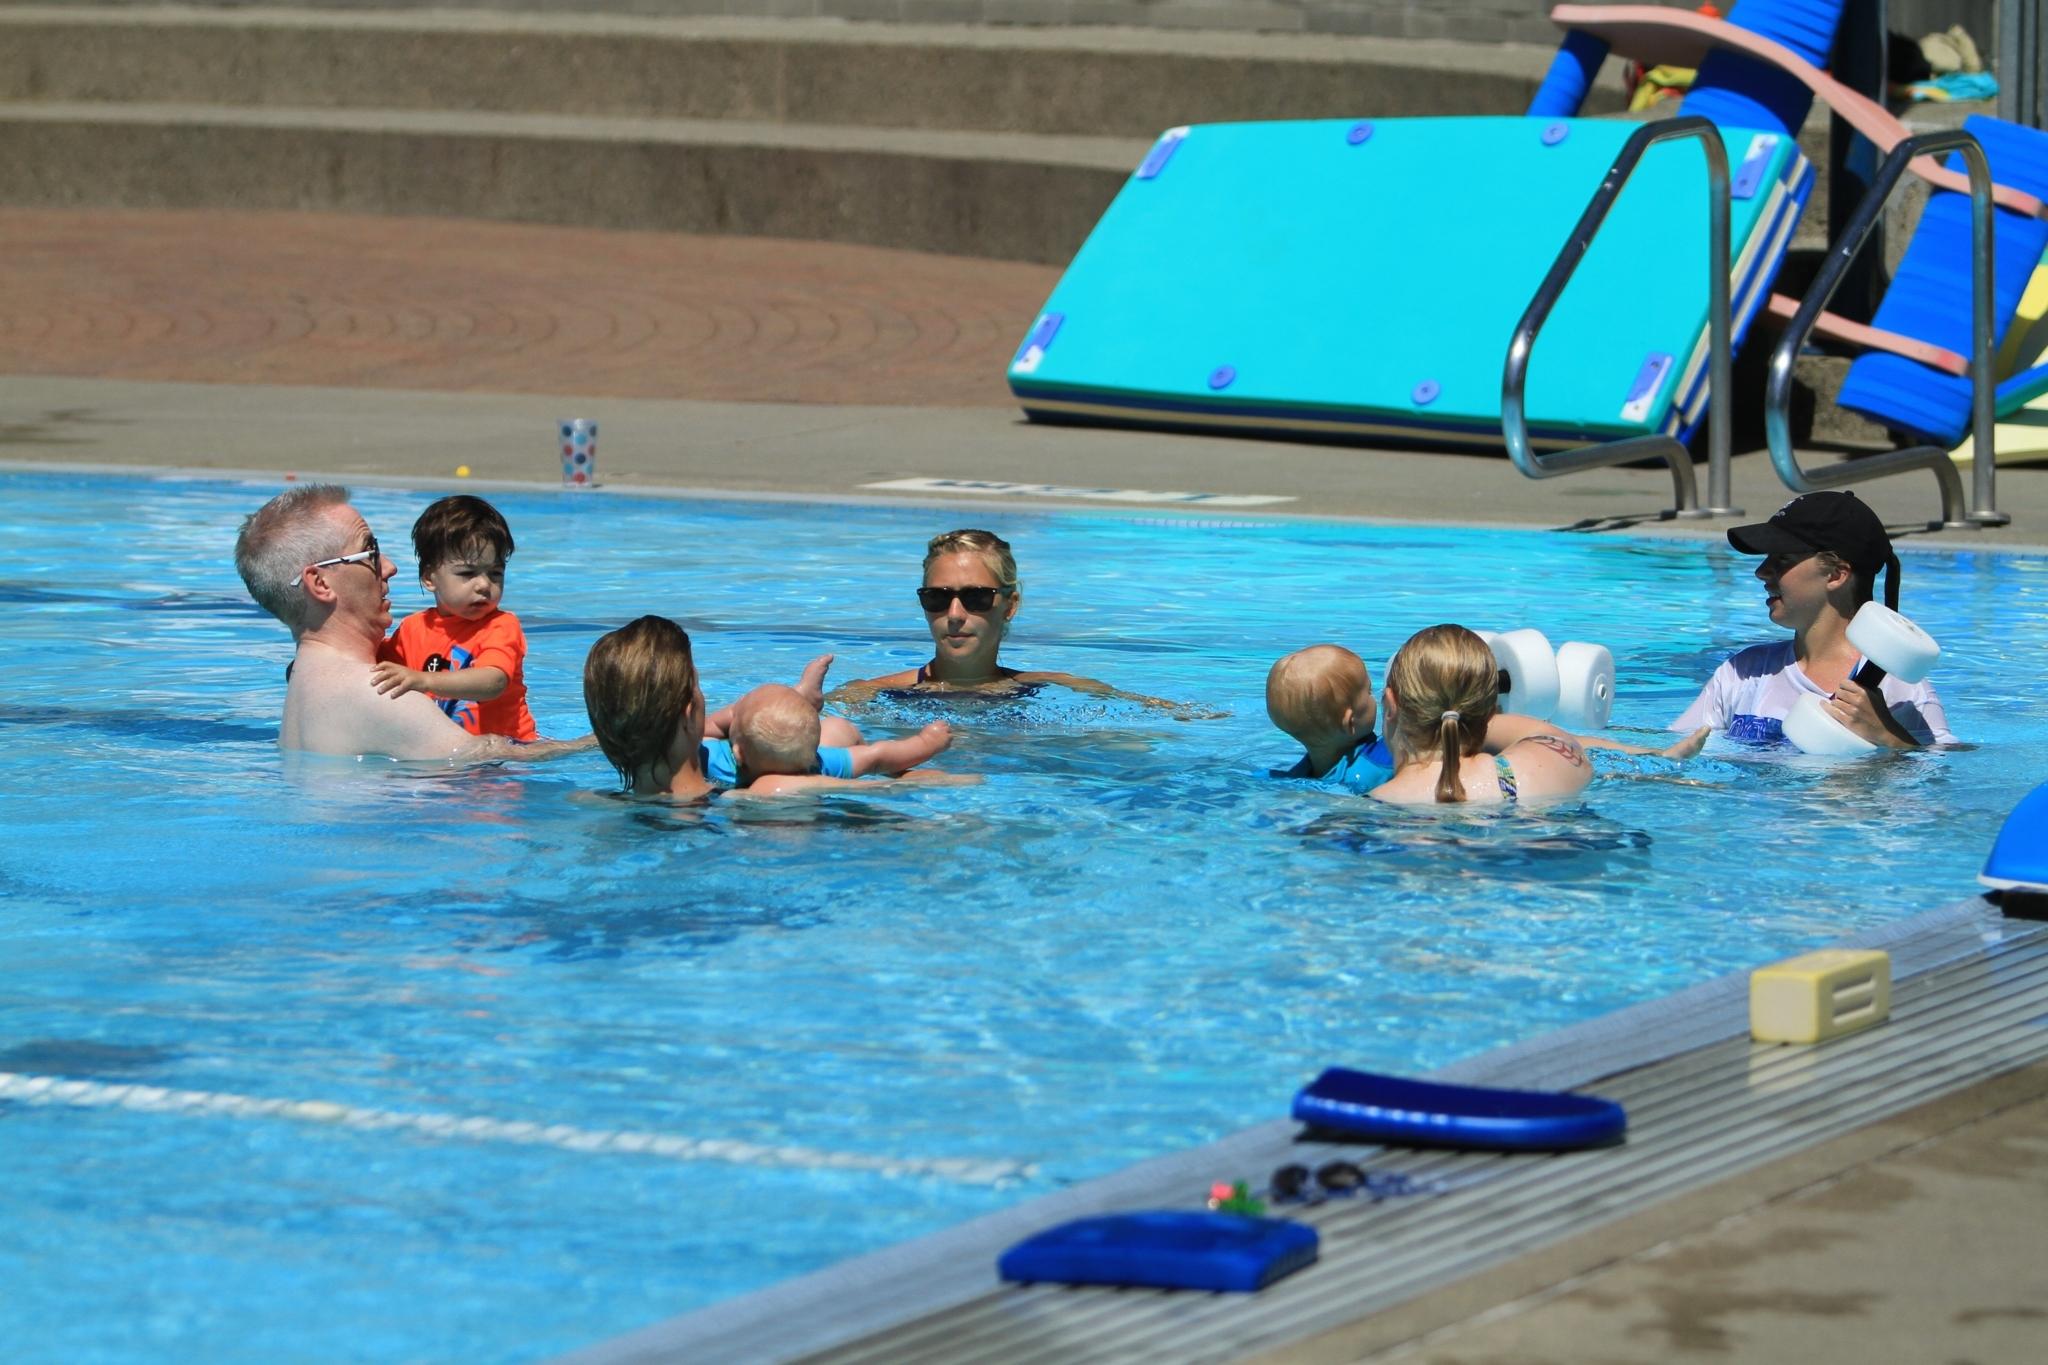 Al Anderson Memorial Pool in Langley